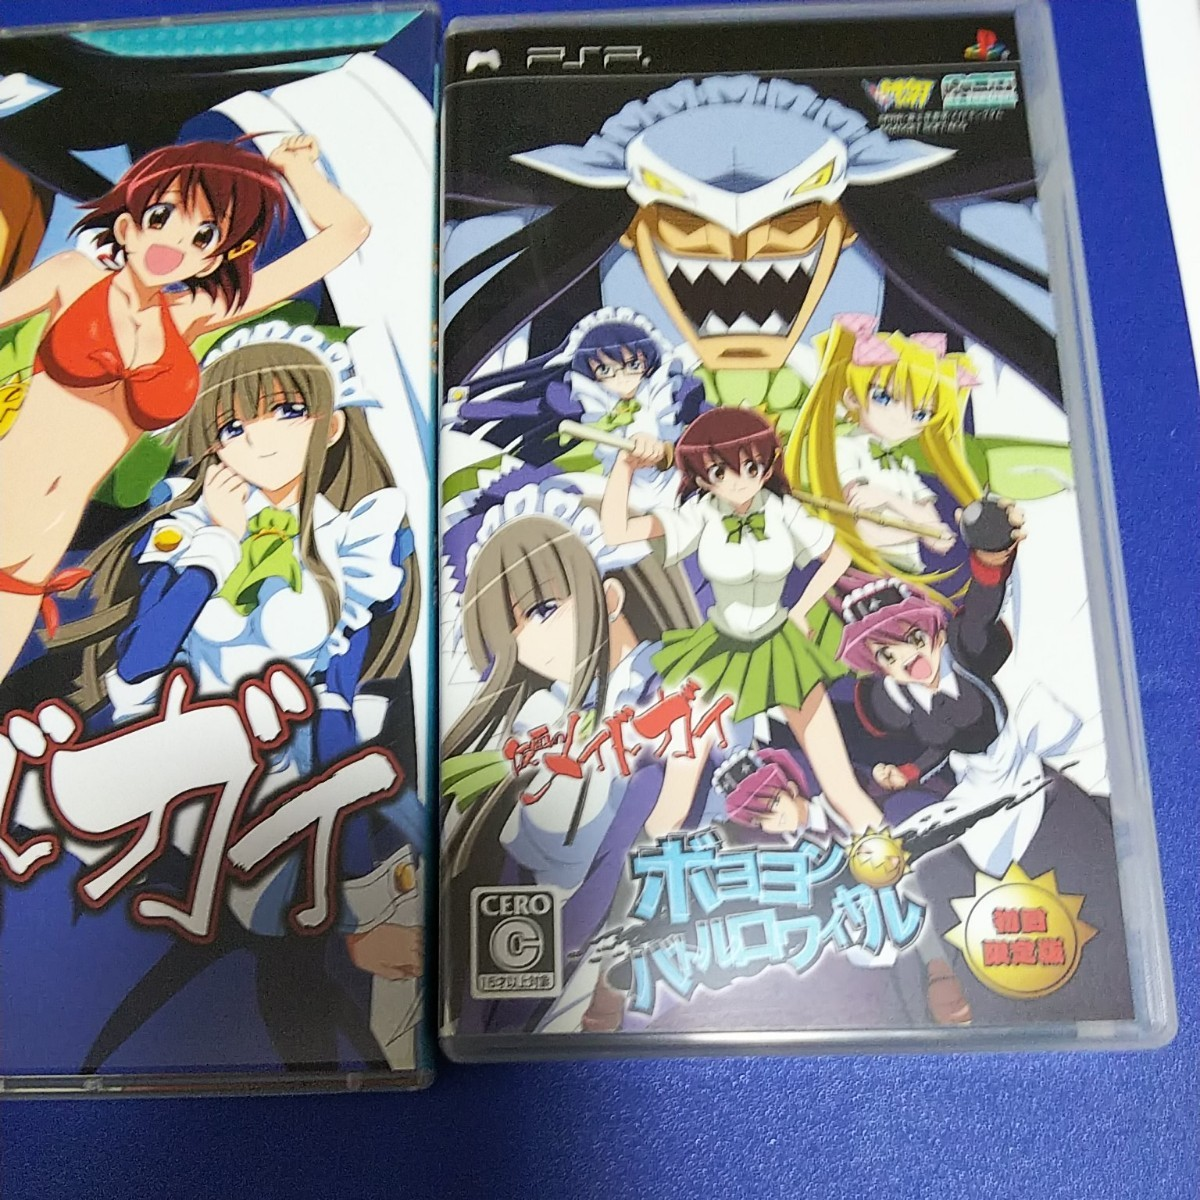 【PSP】 仮面のメイドガイ ~ボヨヨンバトルロワイヤル~ (初回限定版)